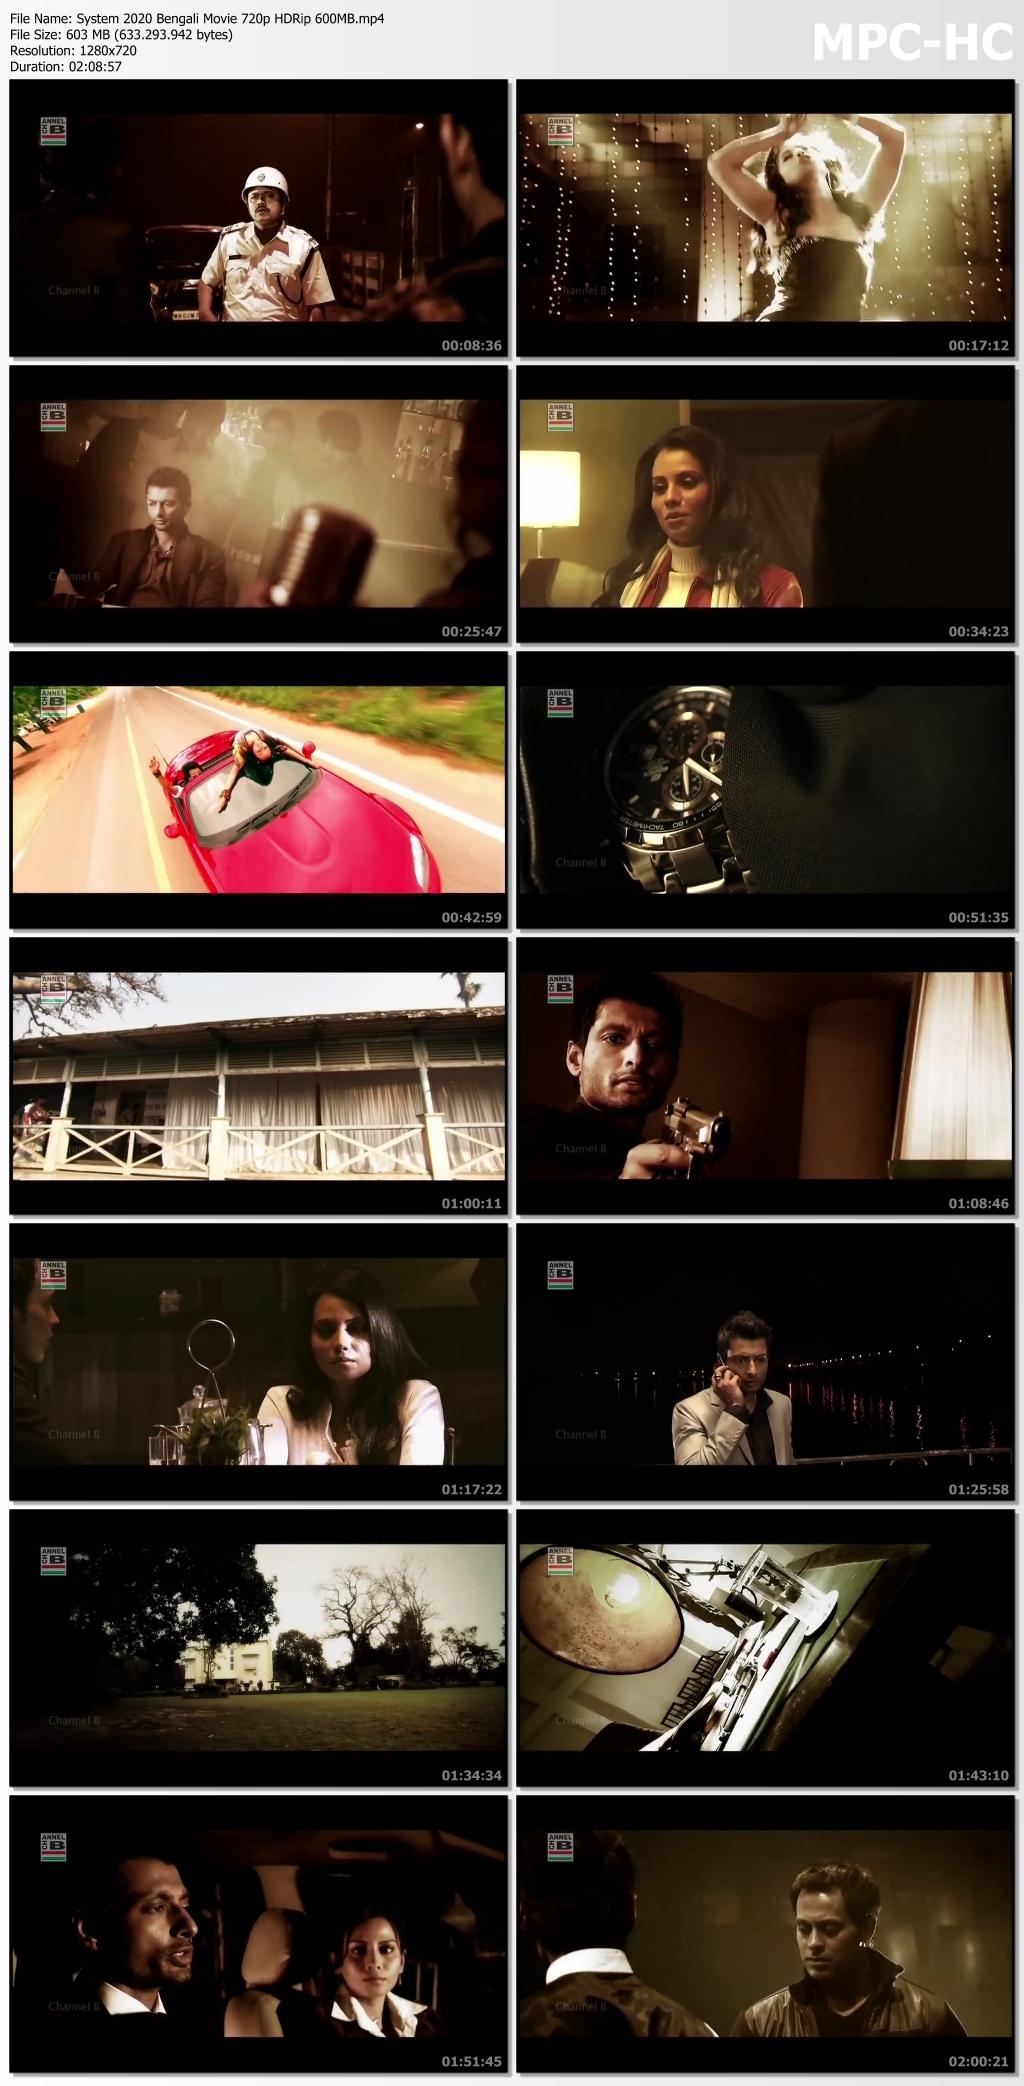 System-2020-Bengali-Movie-720p-HDRip-600-MB-mp4-thumbs